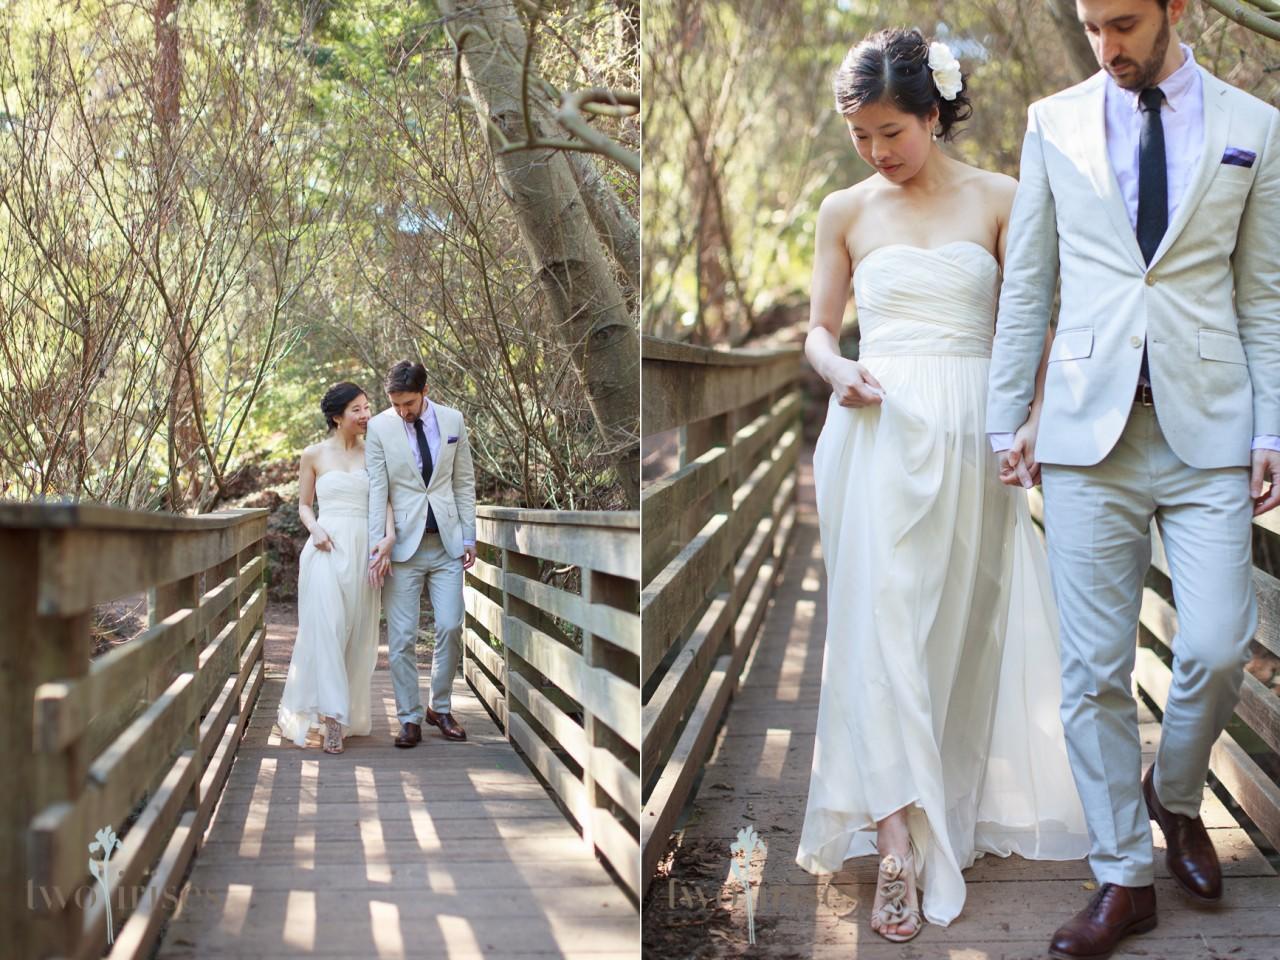 Tilden Botanic Garden Wedding Photos by Two Irises